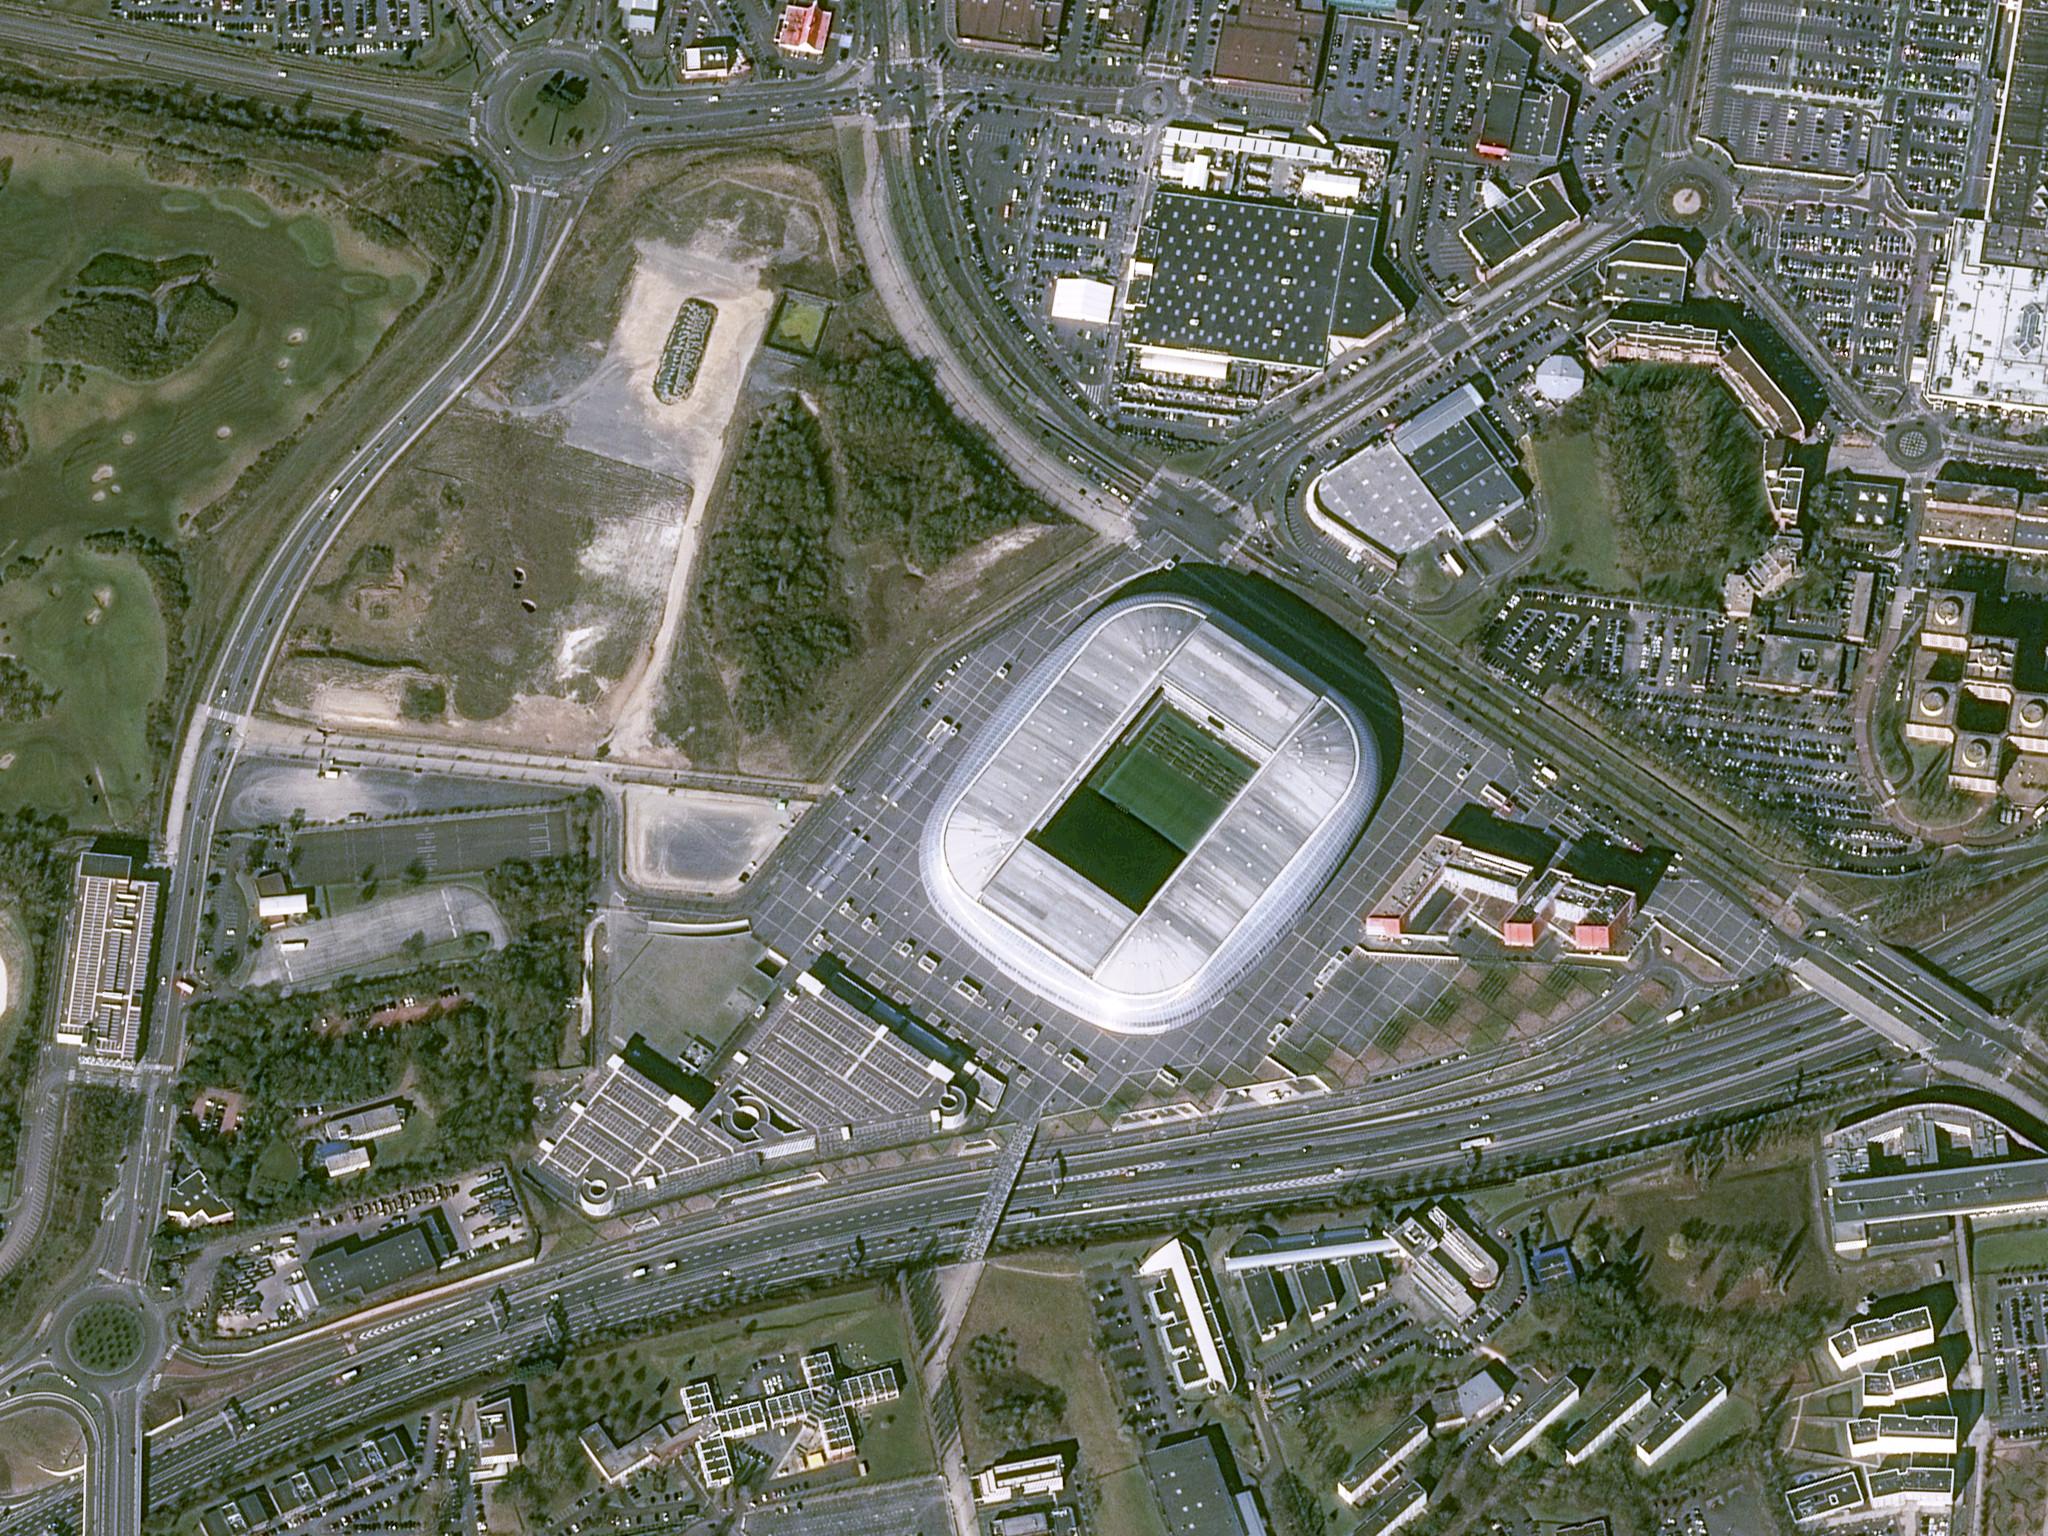 is_euro2016_stade_lille_pleiades_20160317.jpg